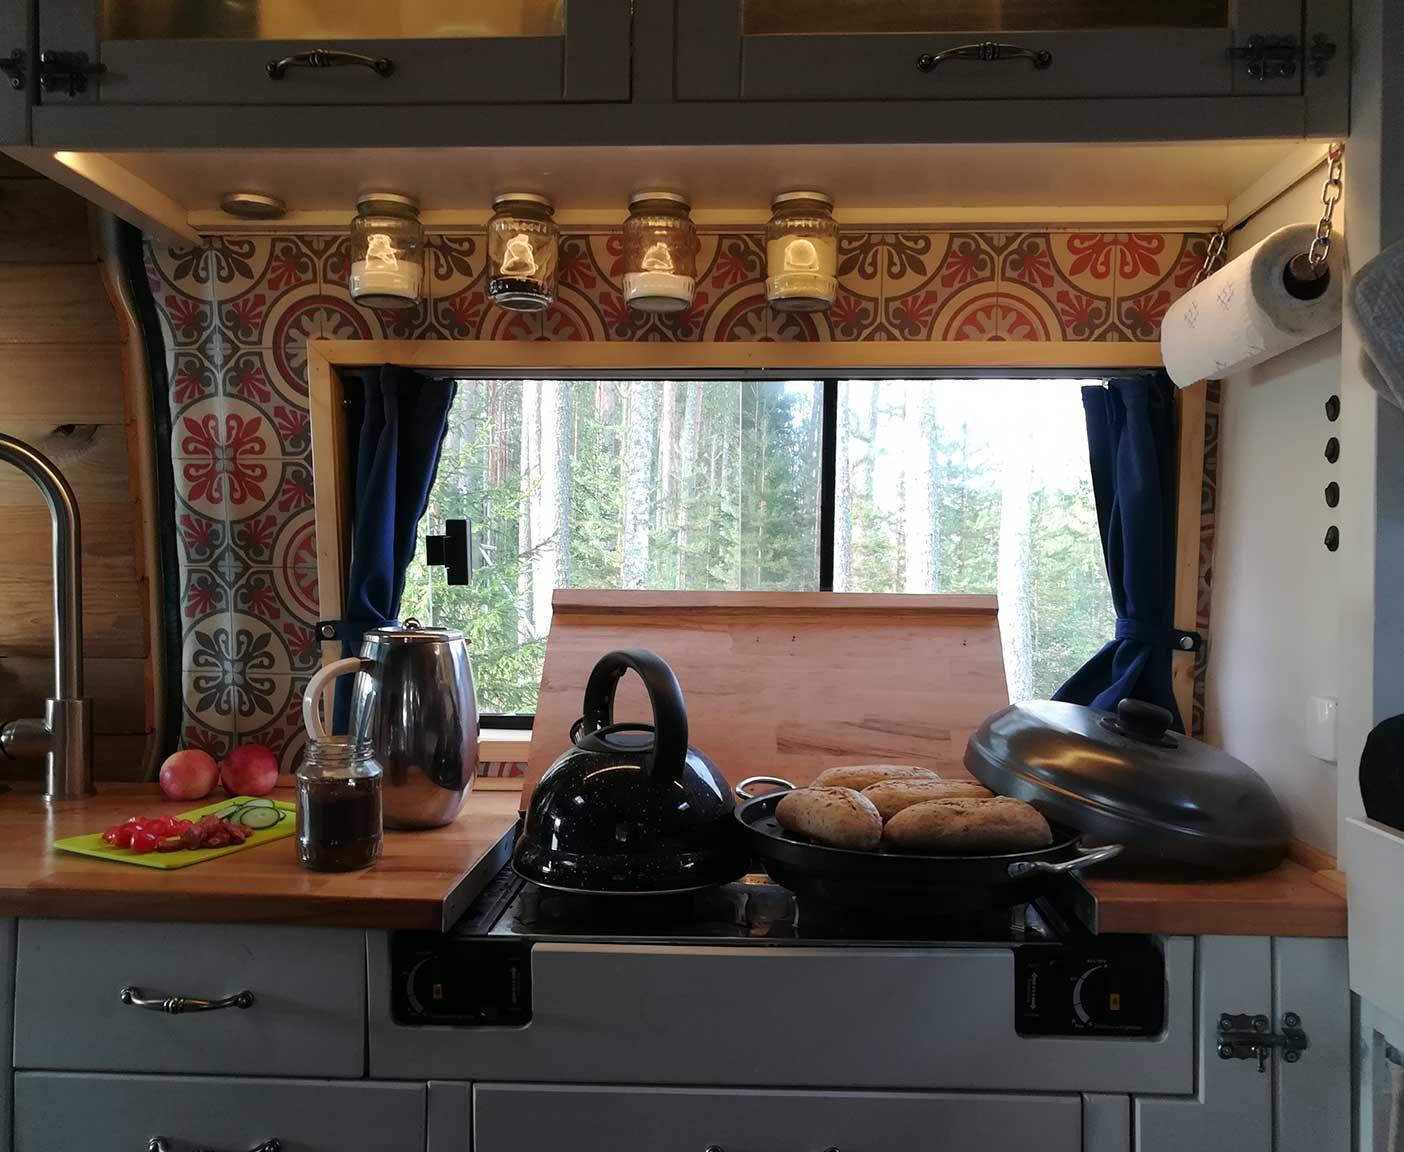 VW-crafter-preis-california-norwegen-4x4-bettkontruktion-selbstausbau-camper